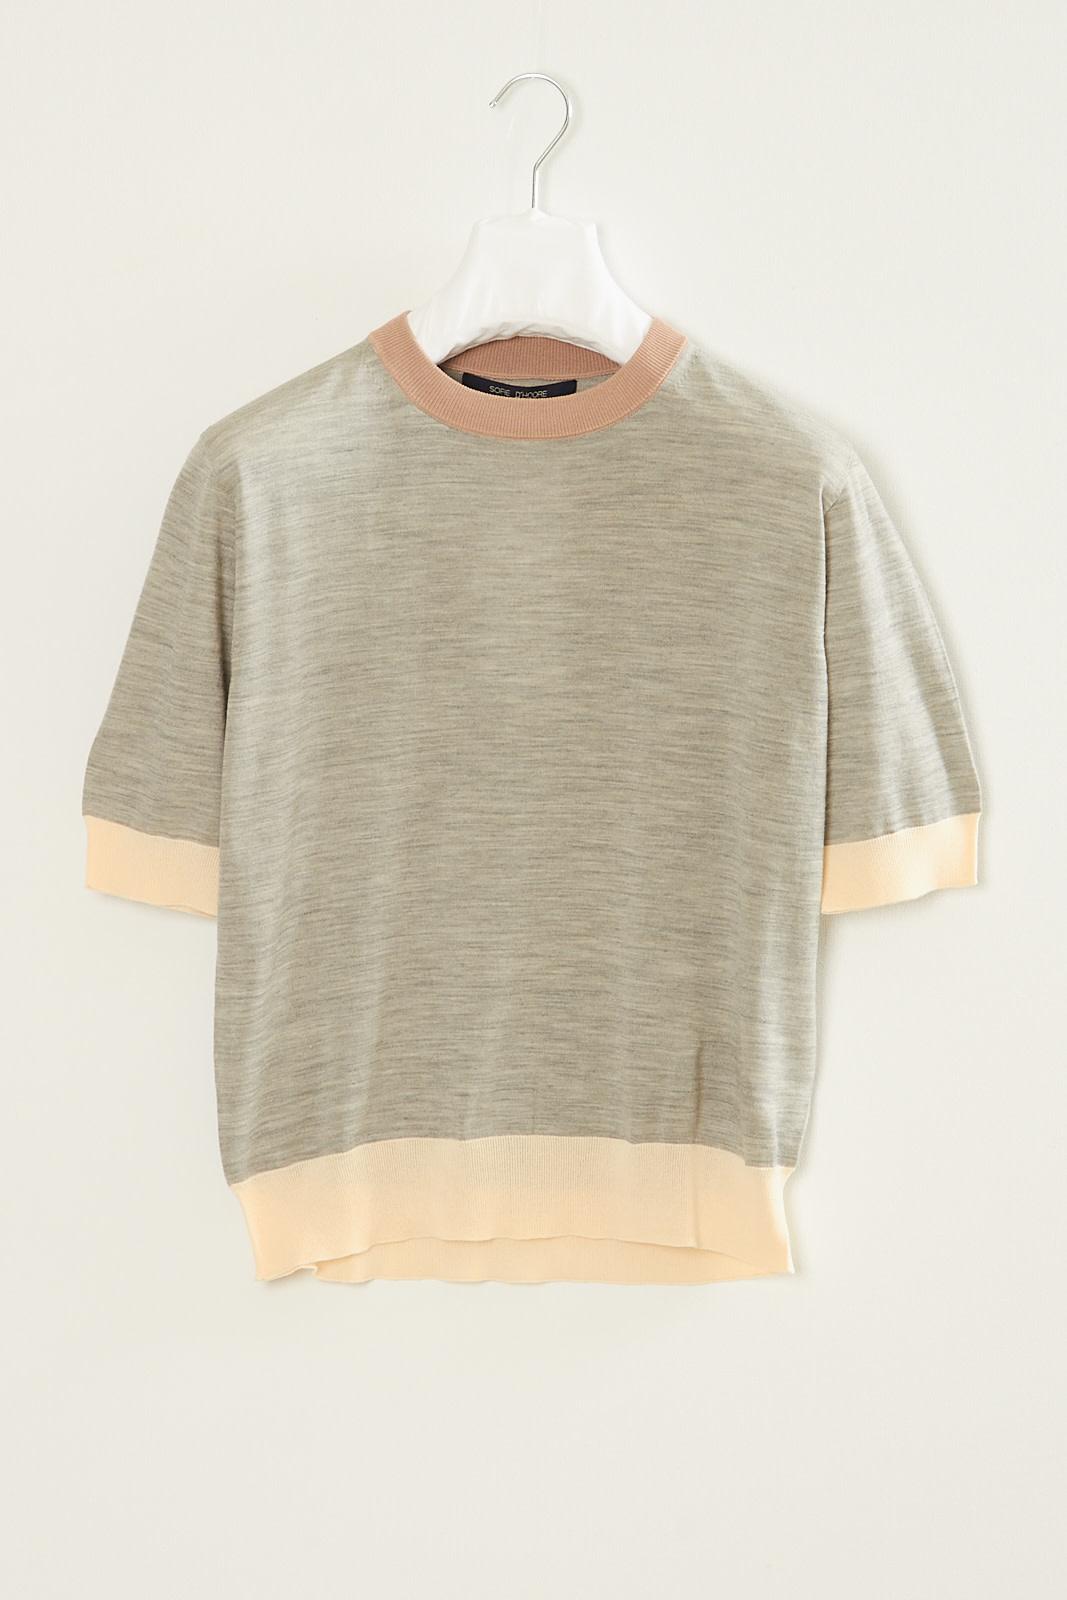 Sofie d'Hoore Muse extra fine merino sweater